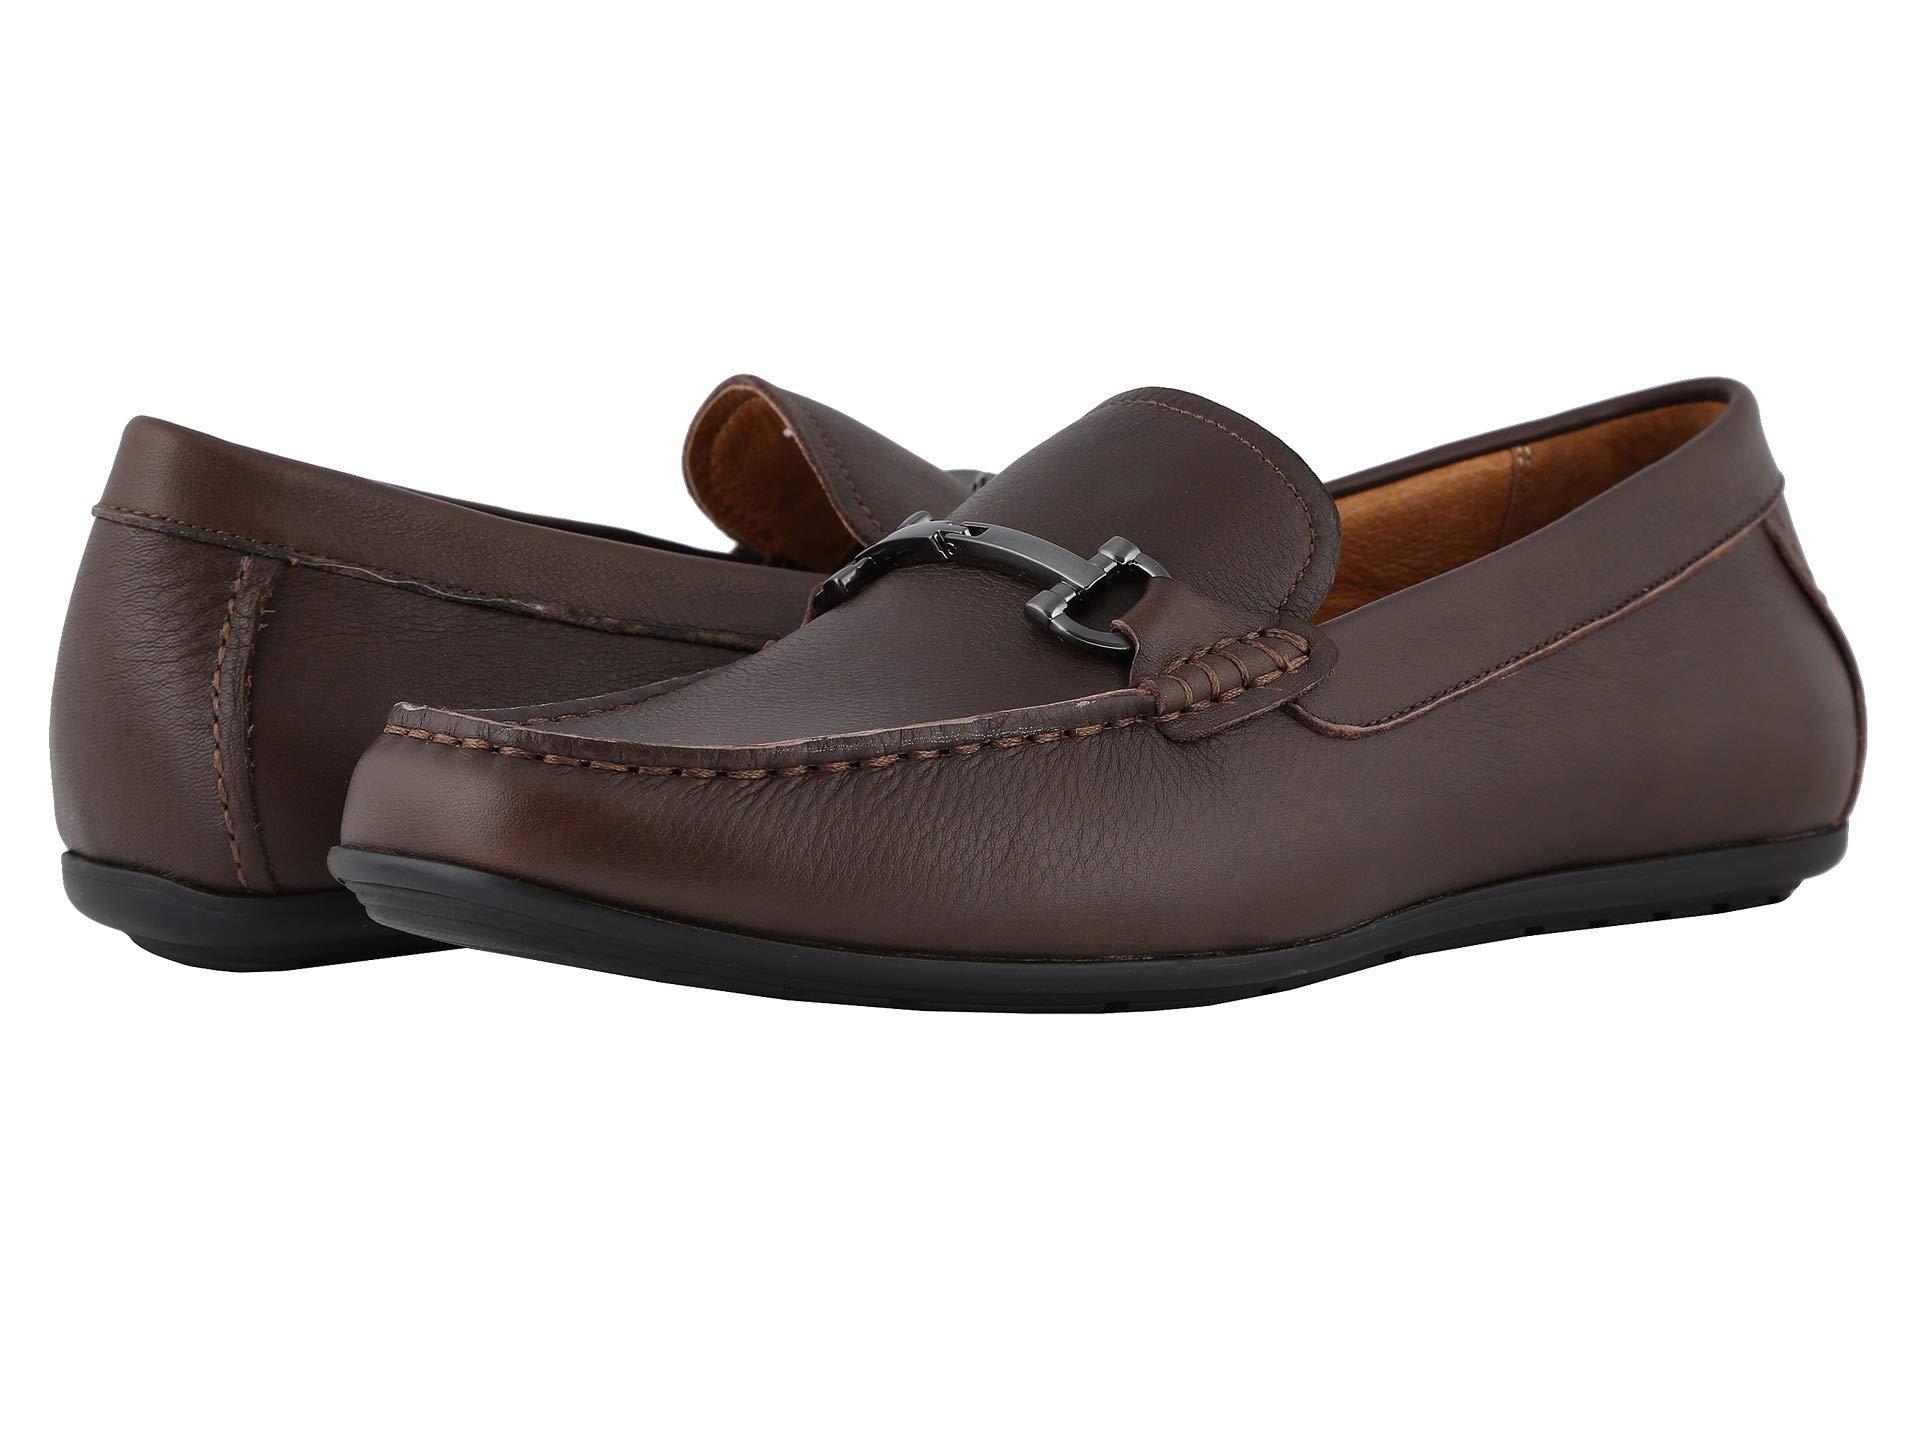 fd242b1db1e33 Vionic - Brown Mason (chocolate) Men's Slip On Shoes for Men - Lyst. View  fullscreen